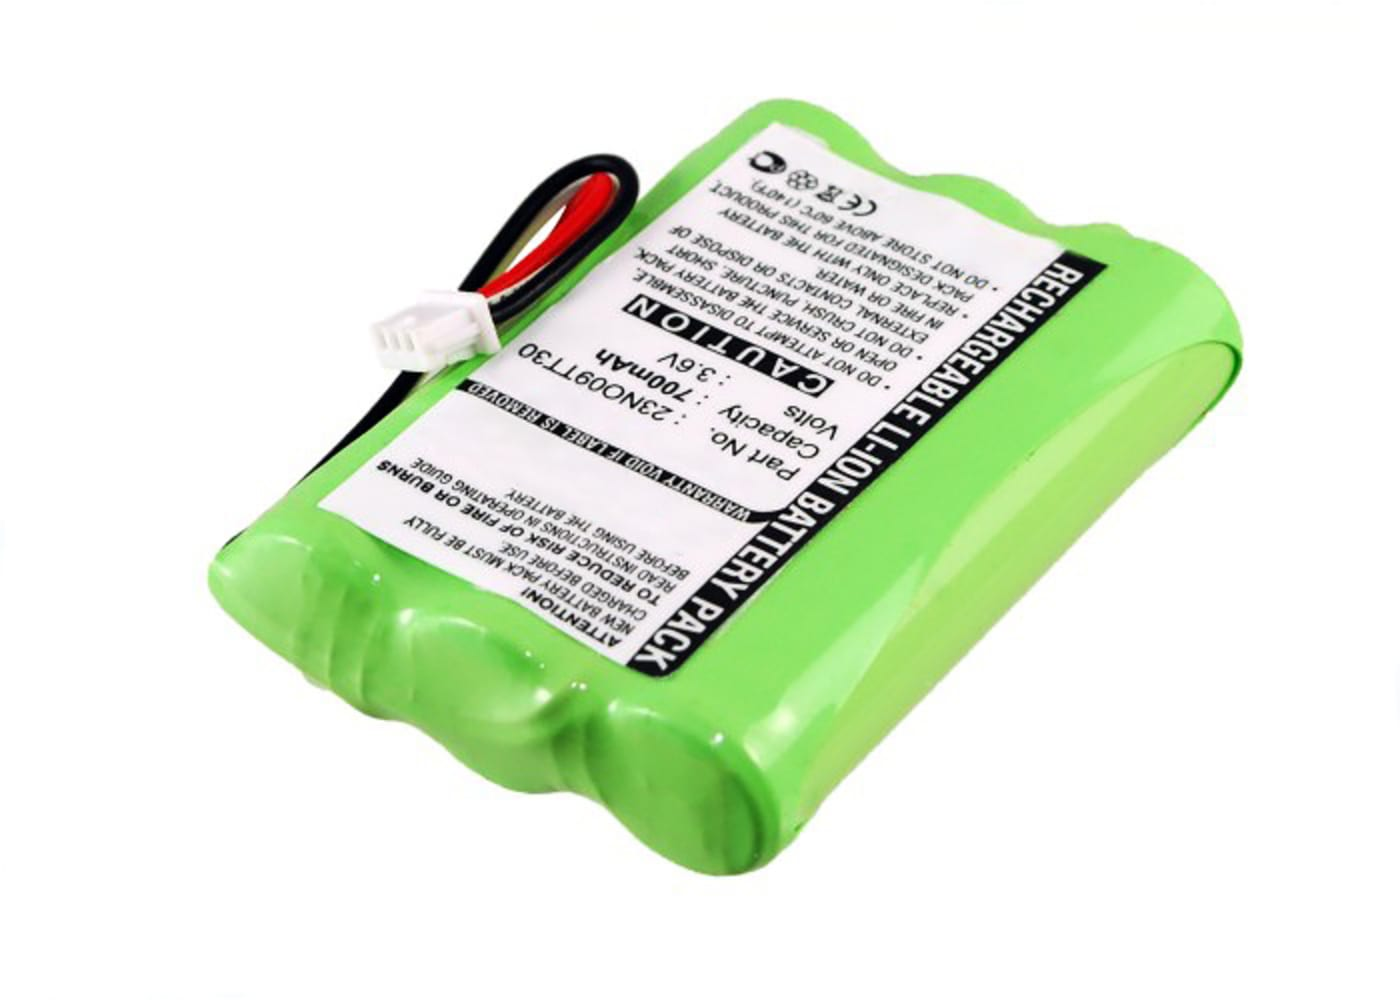 subtel® genopladelige battereri til Agfeo DECT 30 Agfeo DECT 45, Auerswald Comfort DECT 800, Tiptel 500 Dect, Elmeg DECT 400, Kirk T-PLUS2, Polycom KIRK 4040, Spectralink 7440 - 84743411,AH-AAA600F,P11,T016 700mAh - udskift dit mobilbatteri